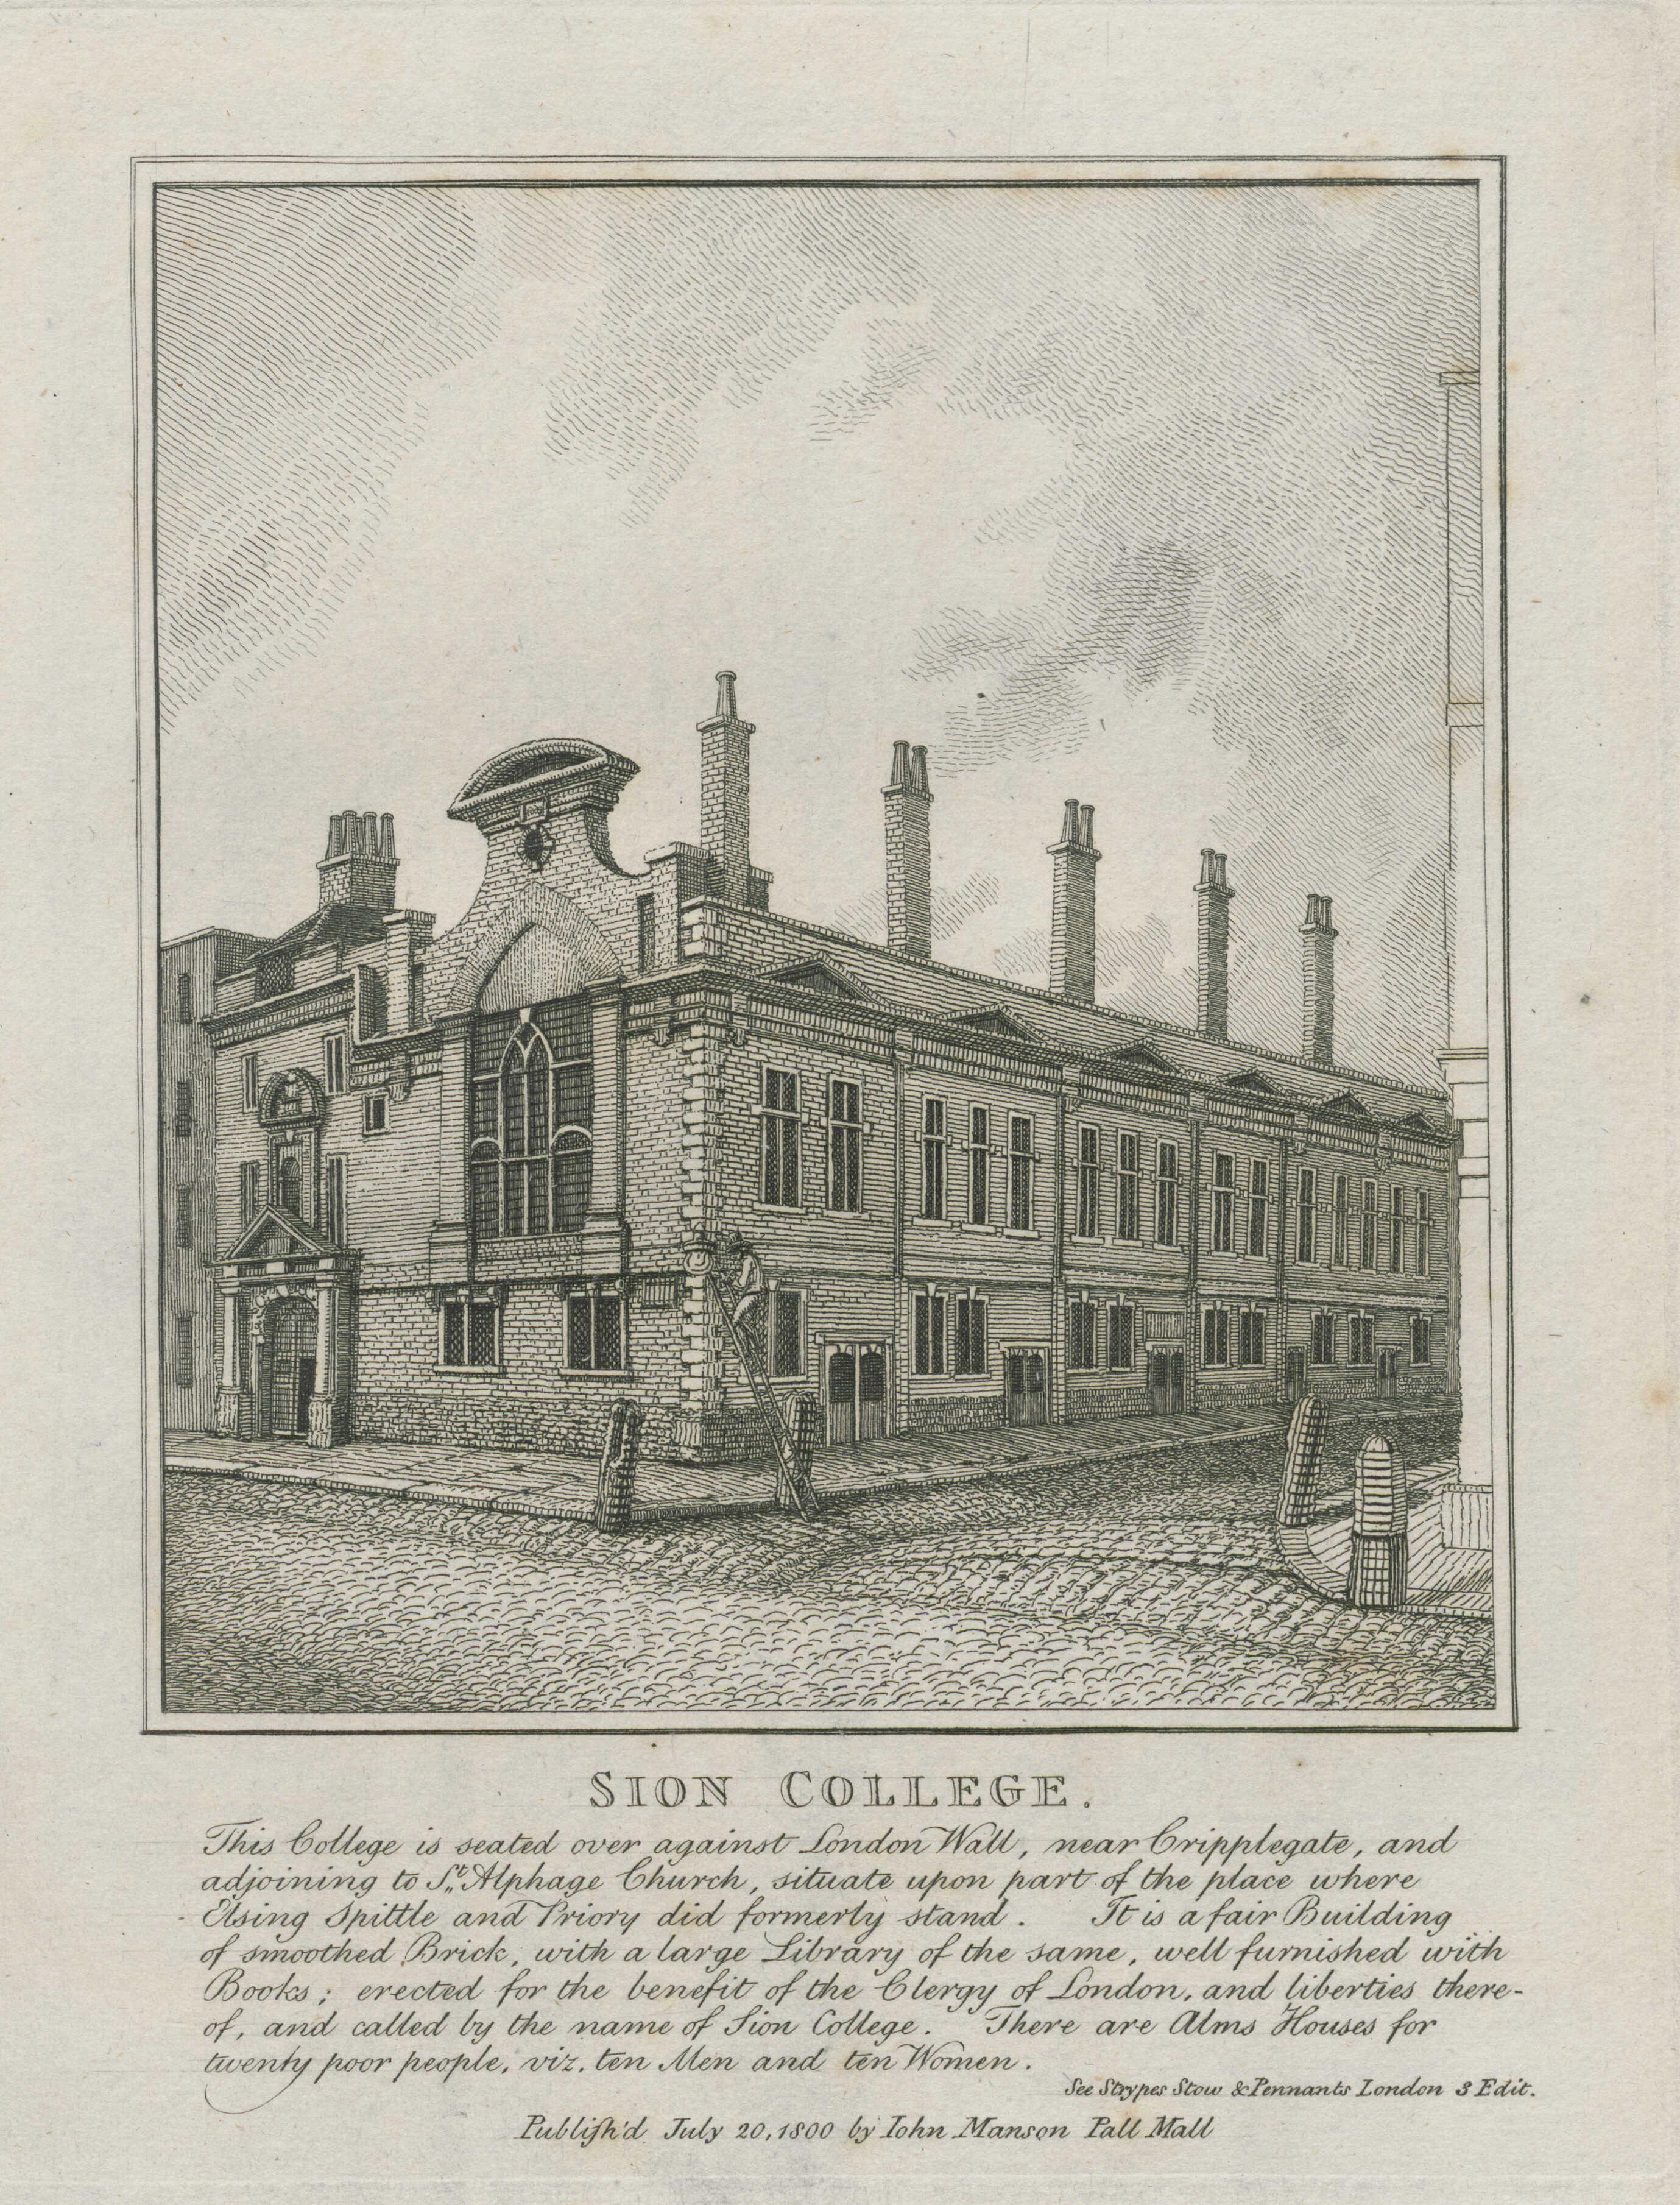 82-sion-college